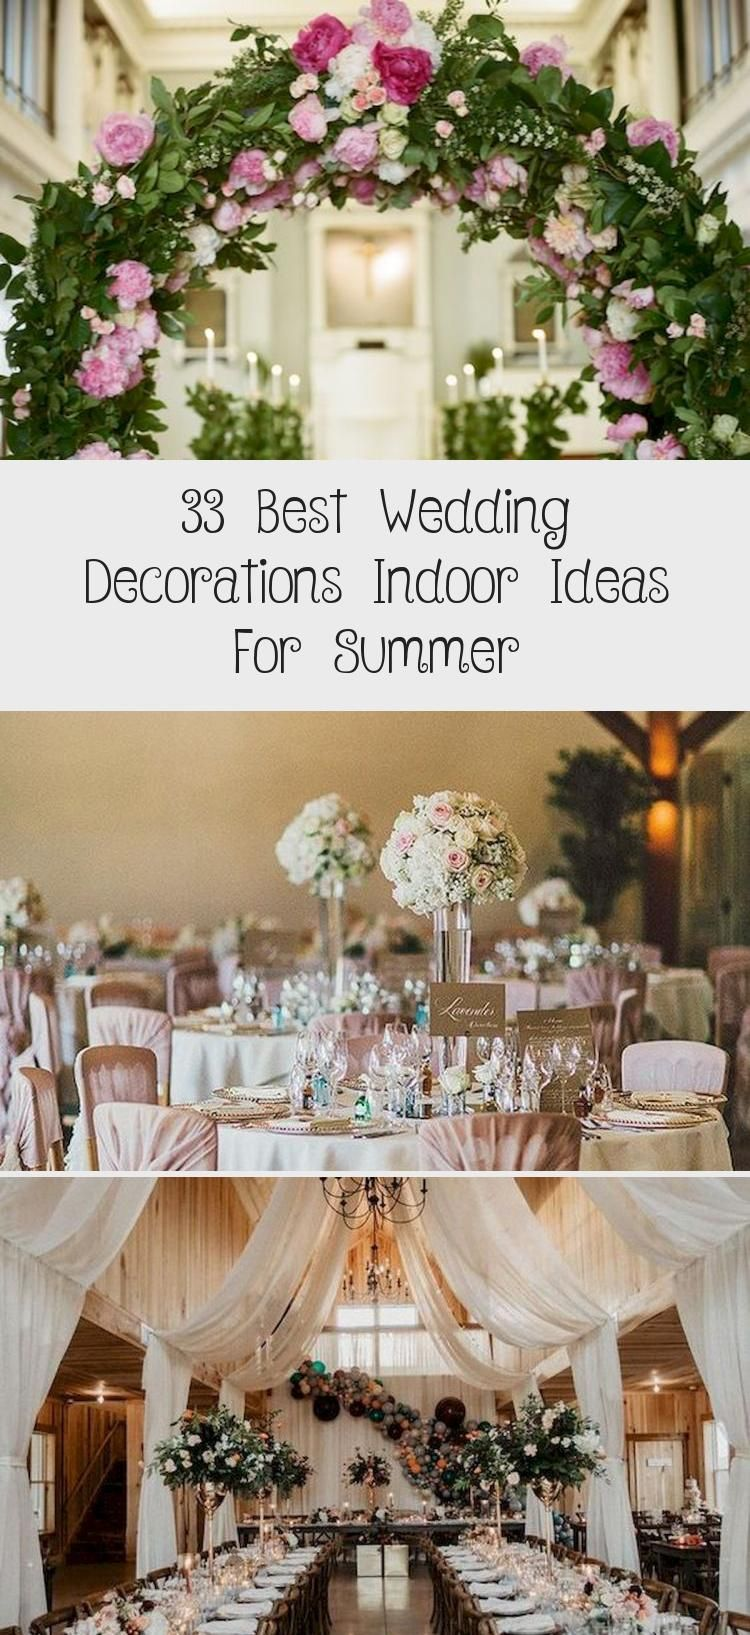 33 Best Wedding Decorations Indoor Ideas For Summer ...